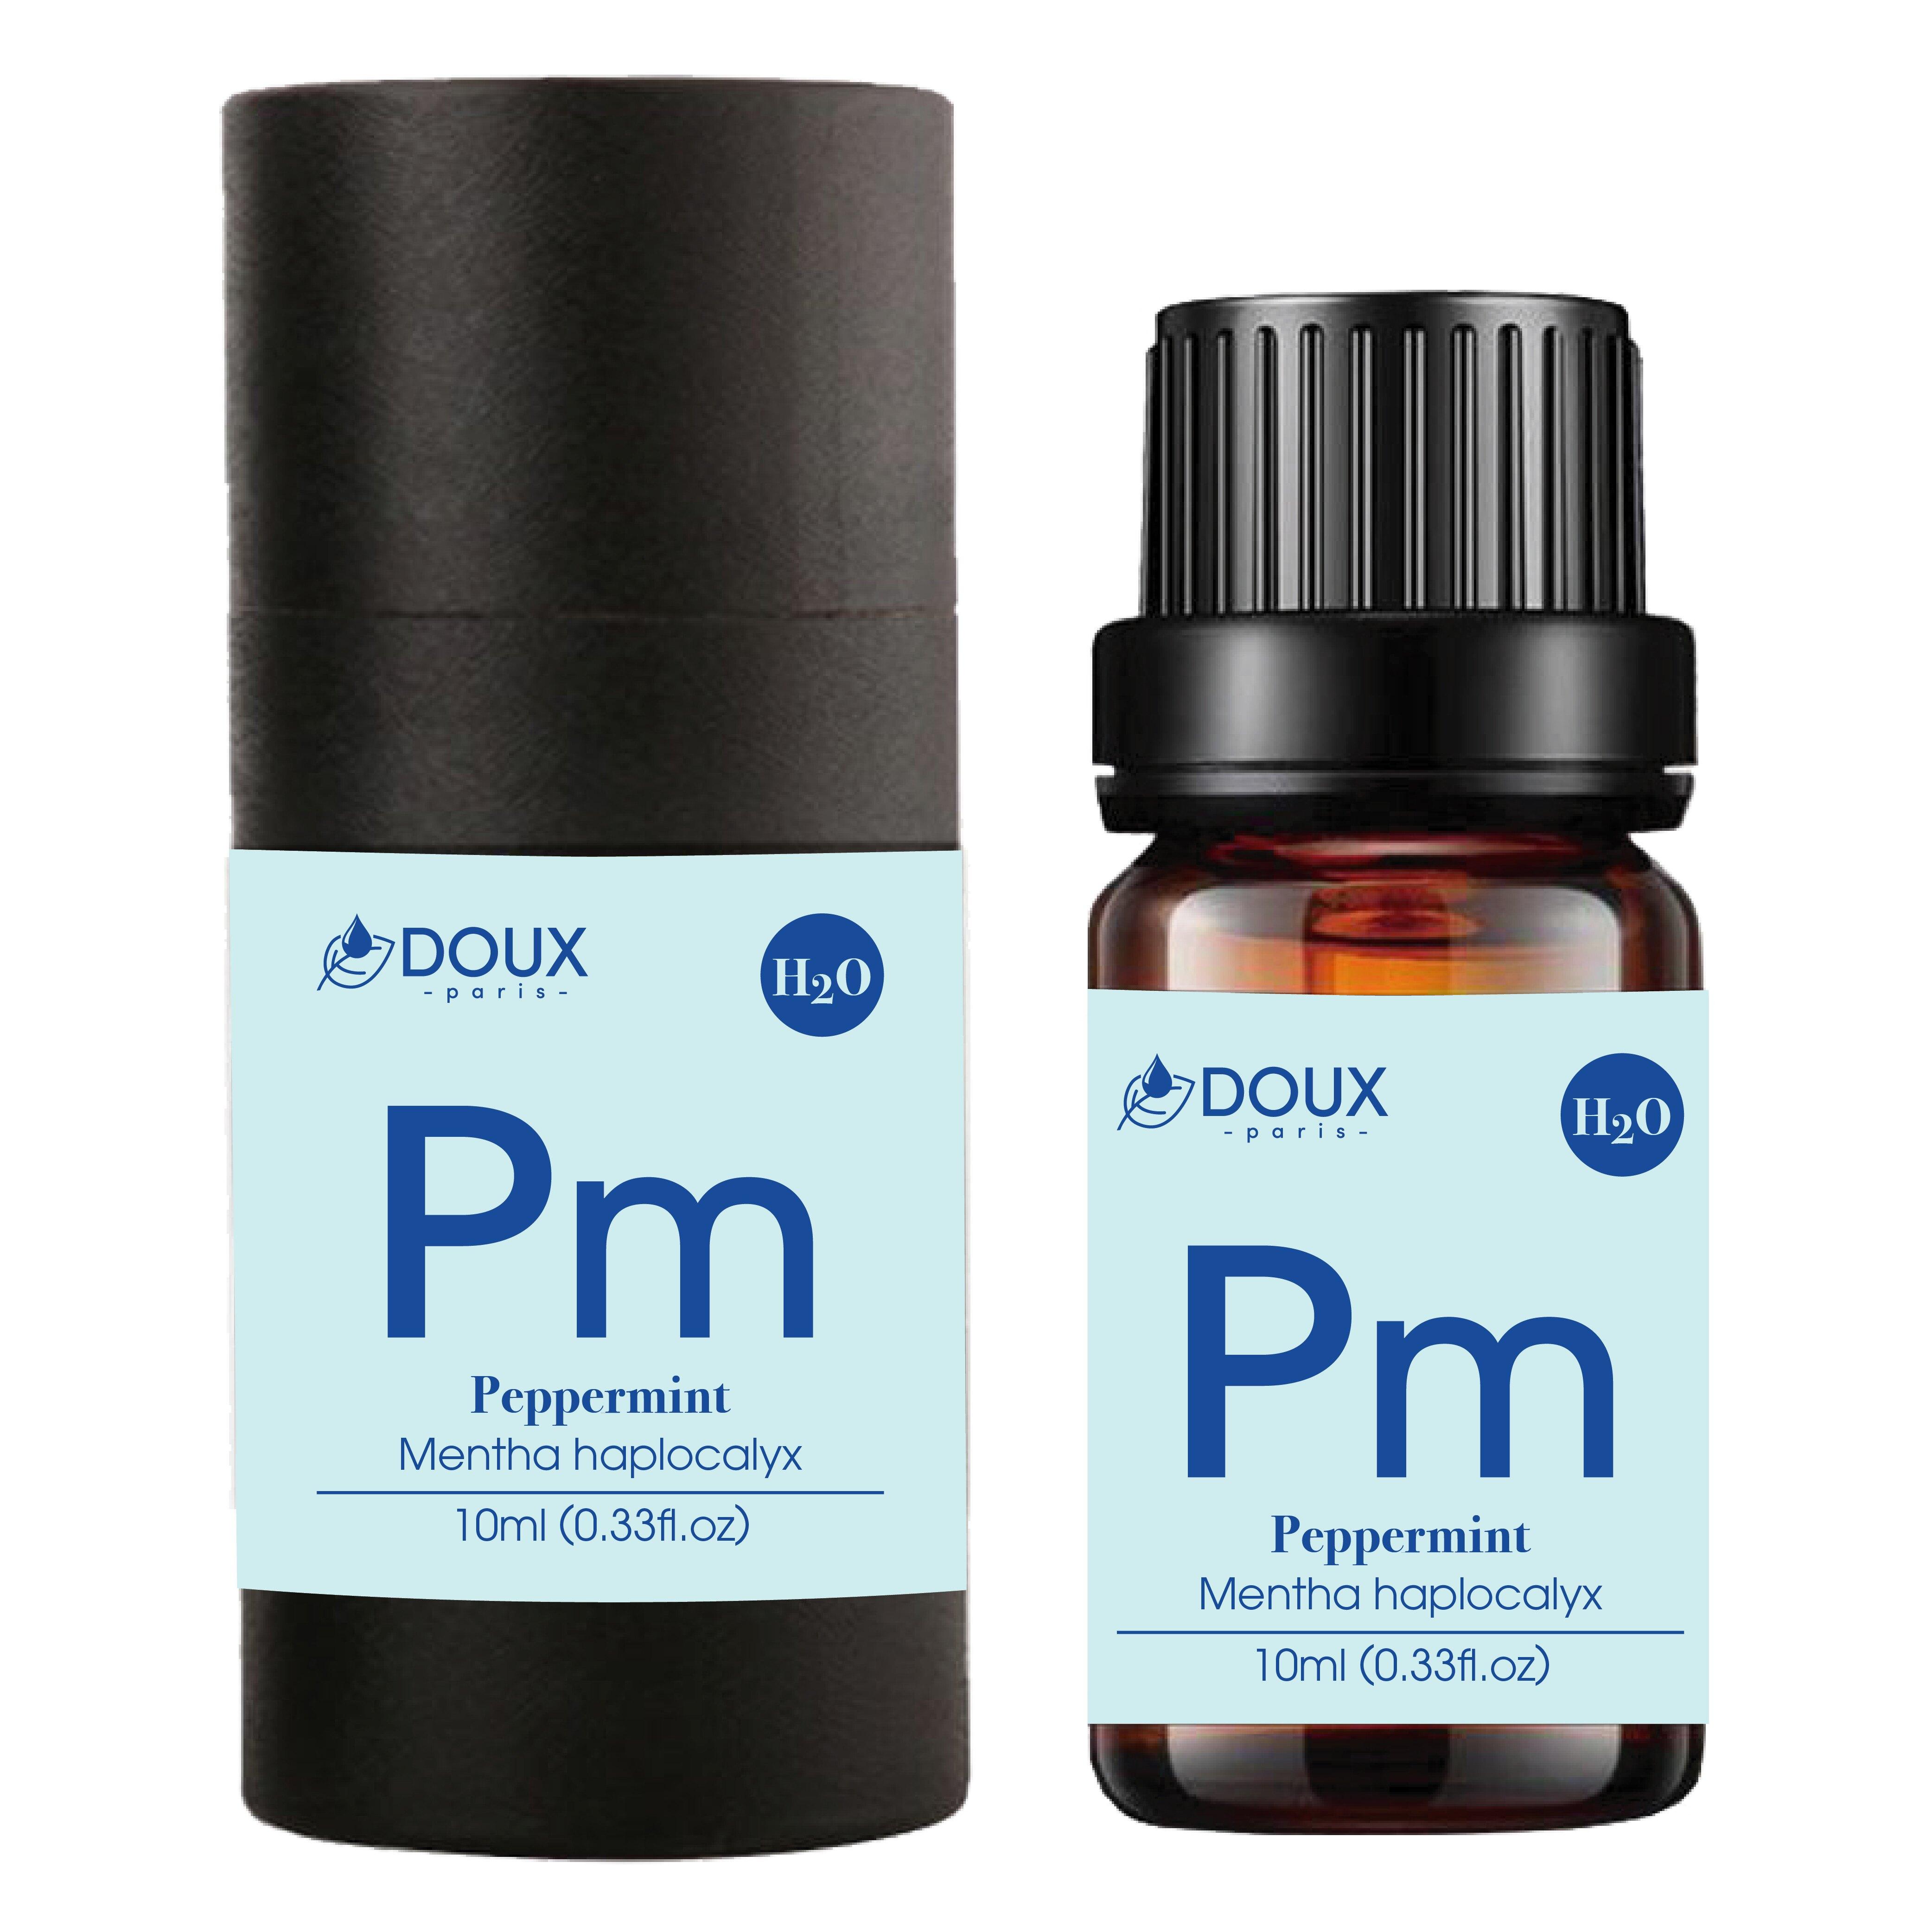 DOUX 薄荷水溶性精油 10ml 法國水氧機專用 泡澡精油